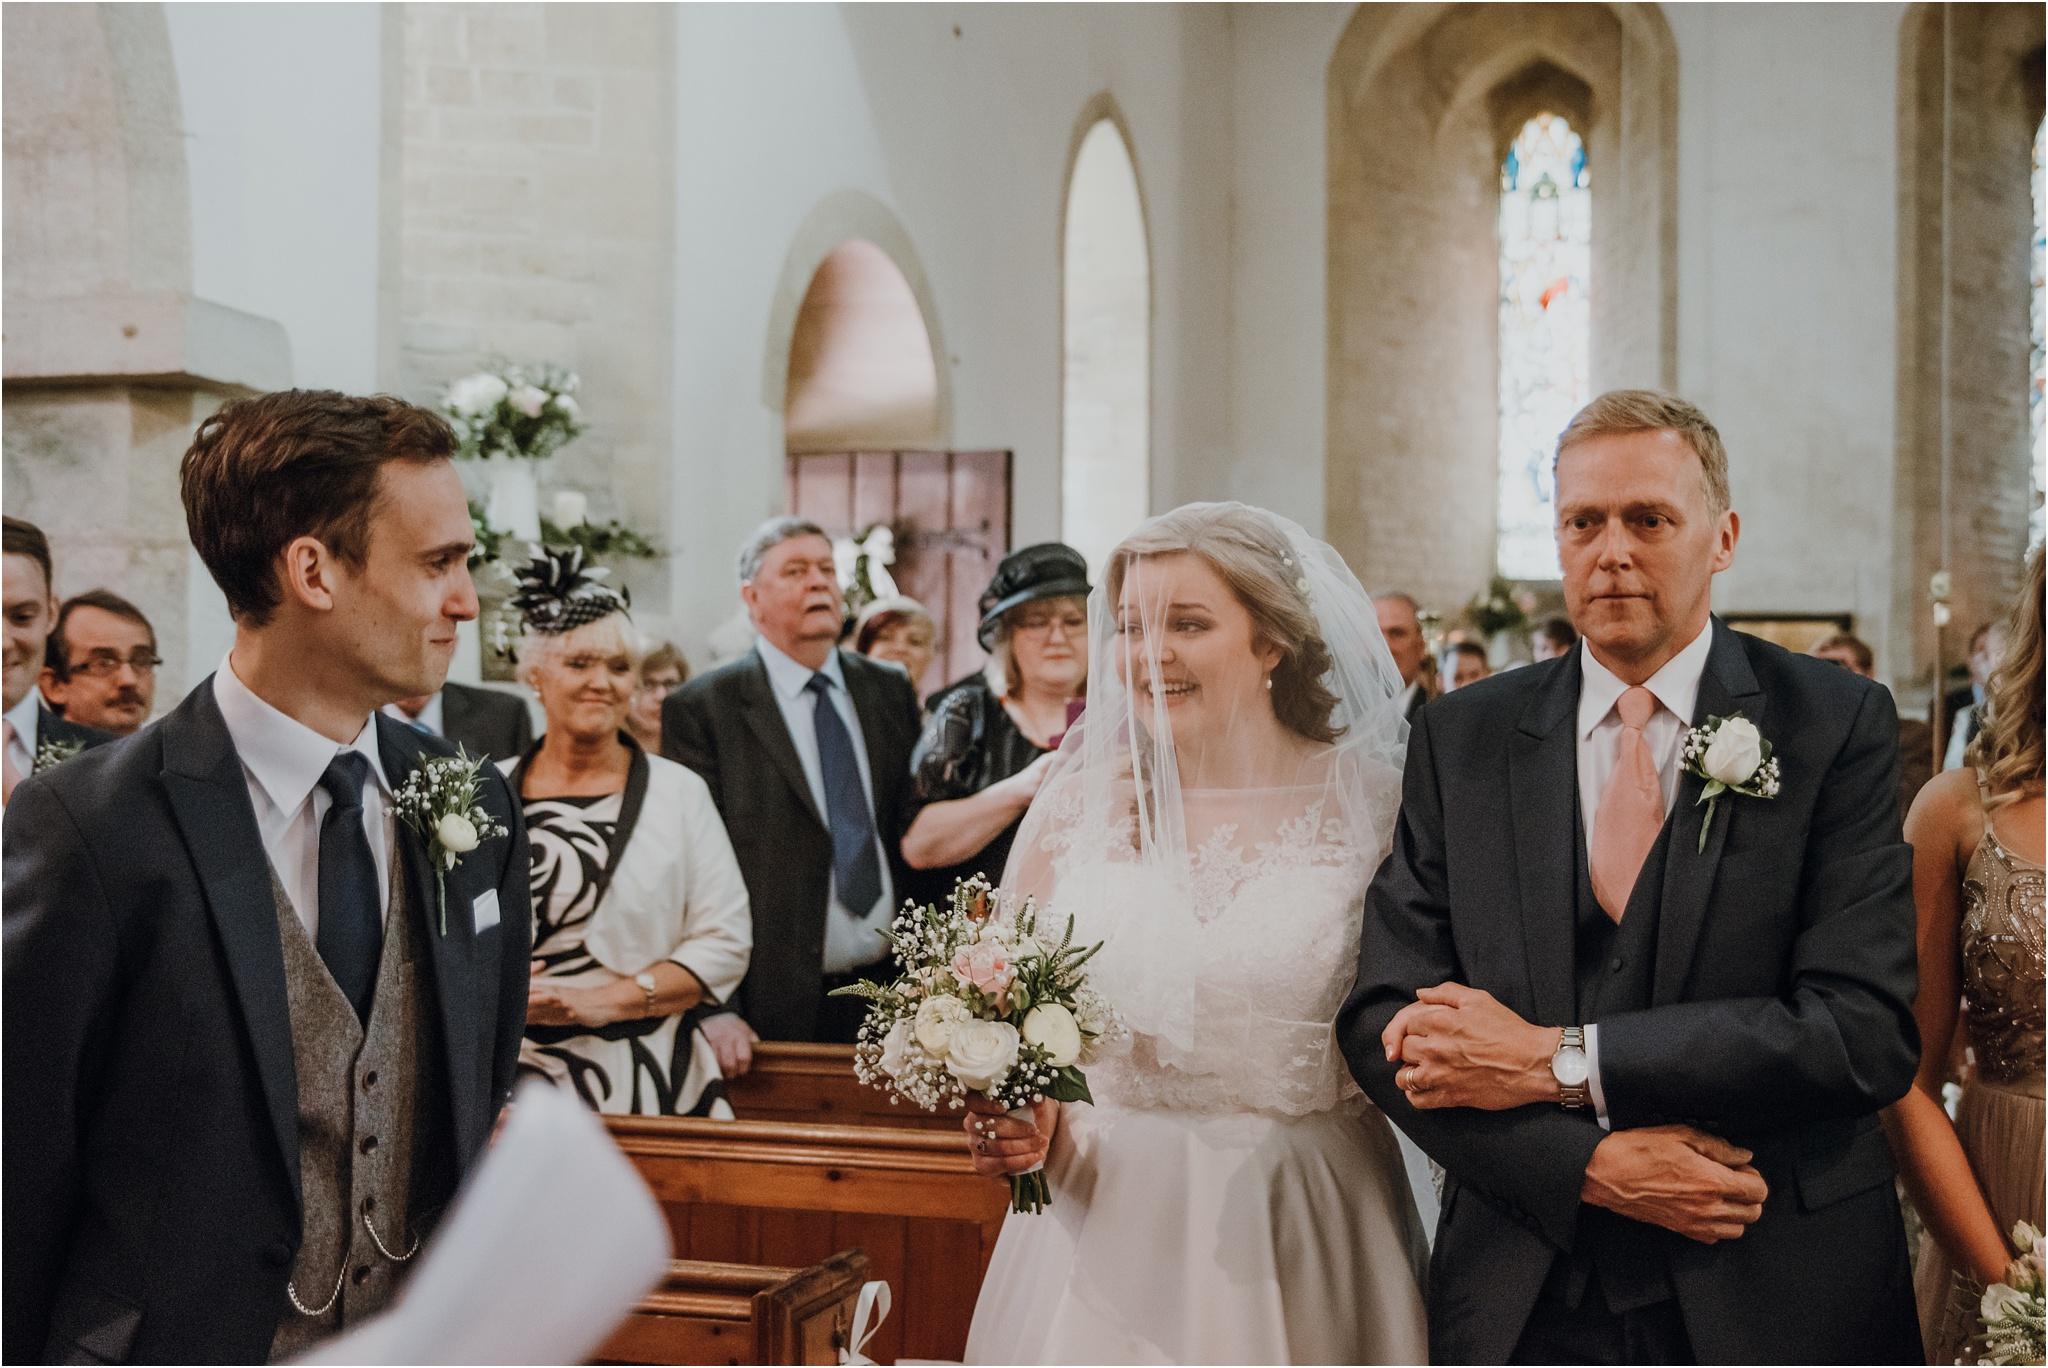 Outdoor-country-wedding-Edinburgh-photographer__0064.jpg